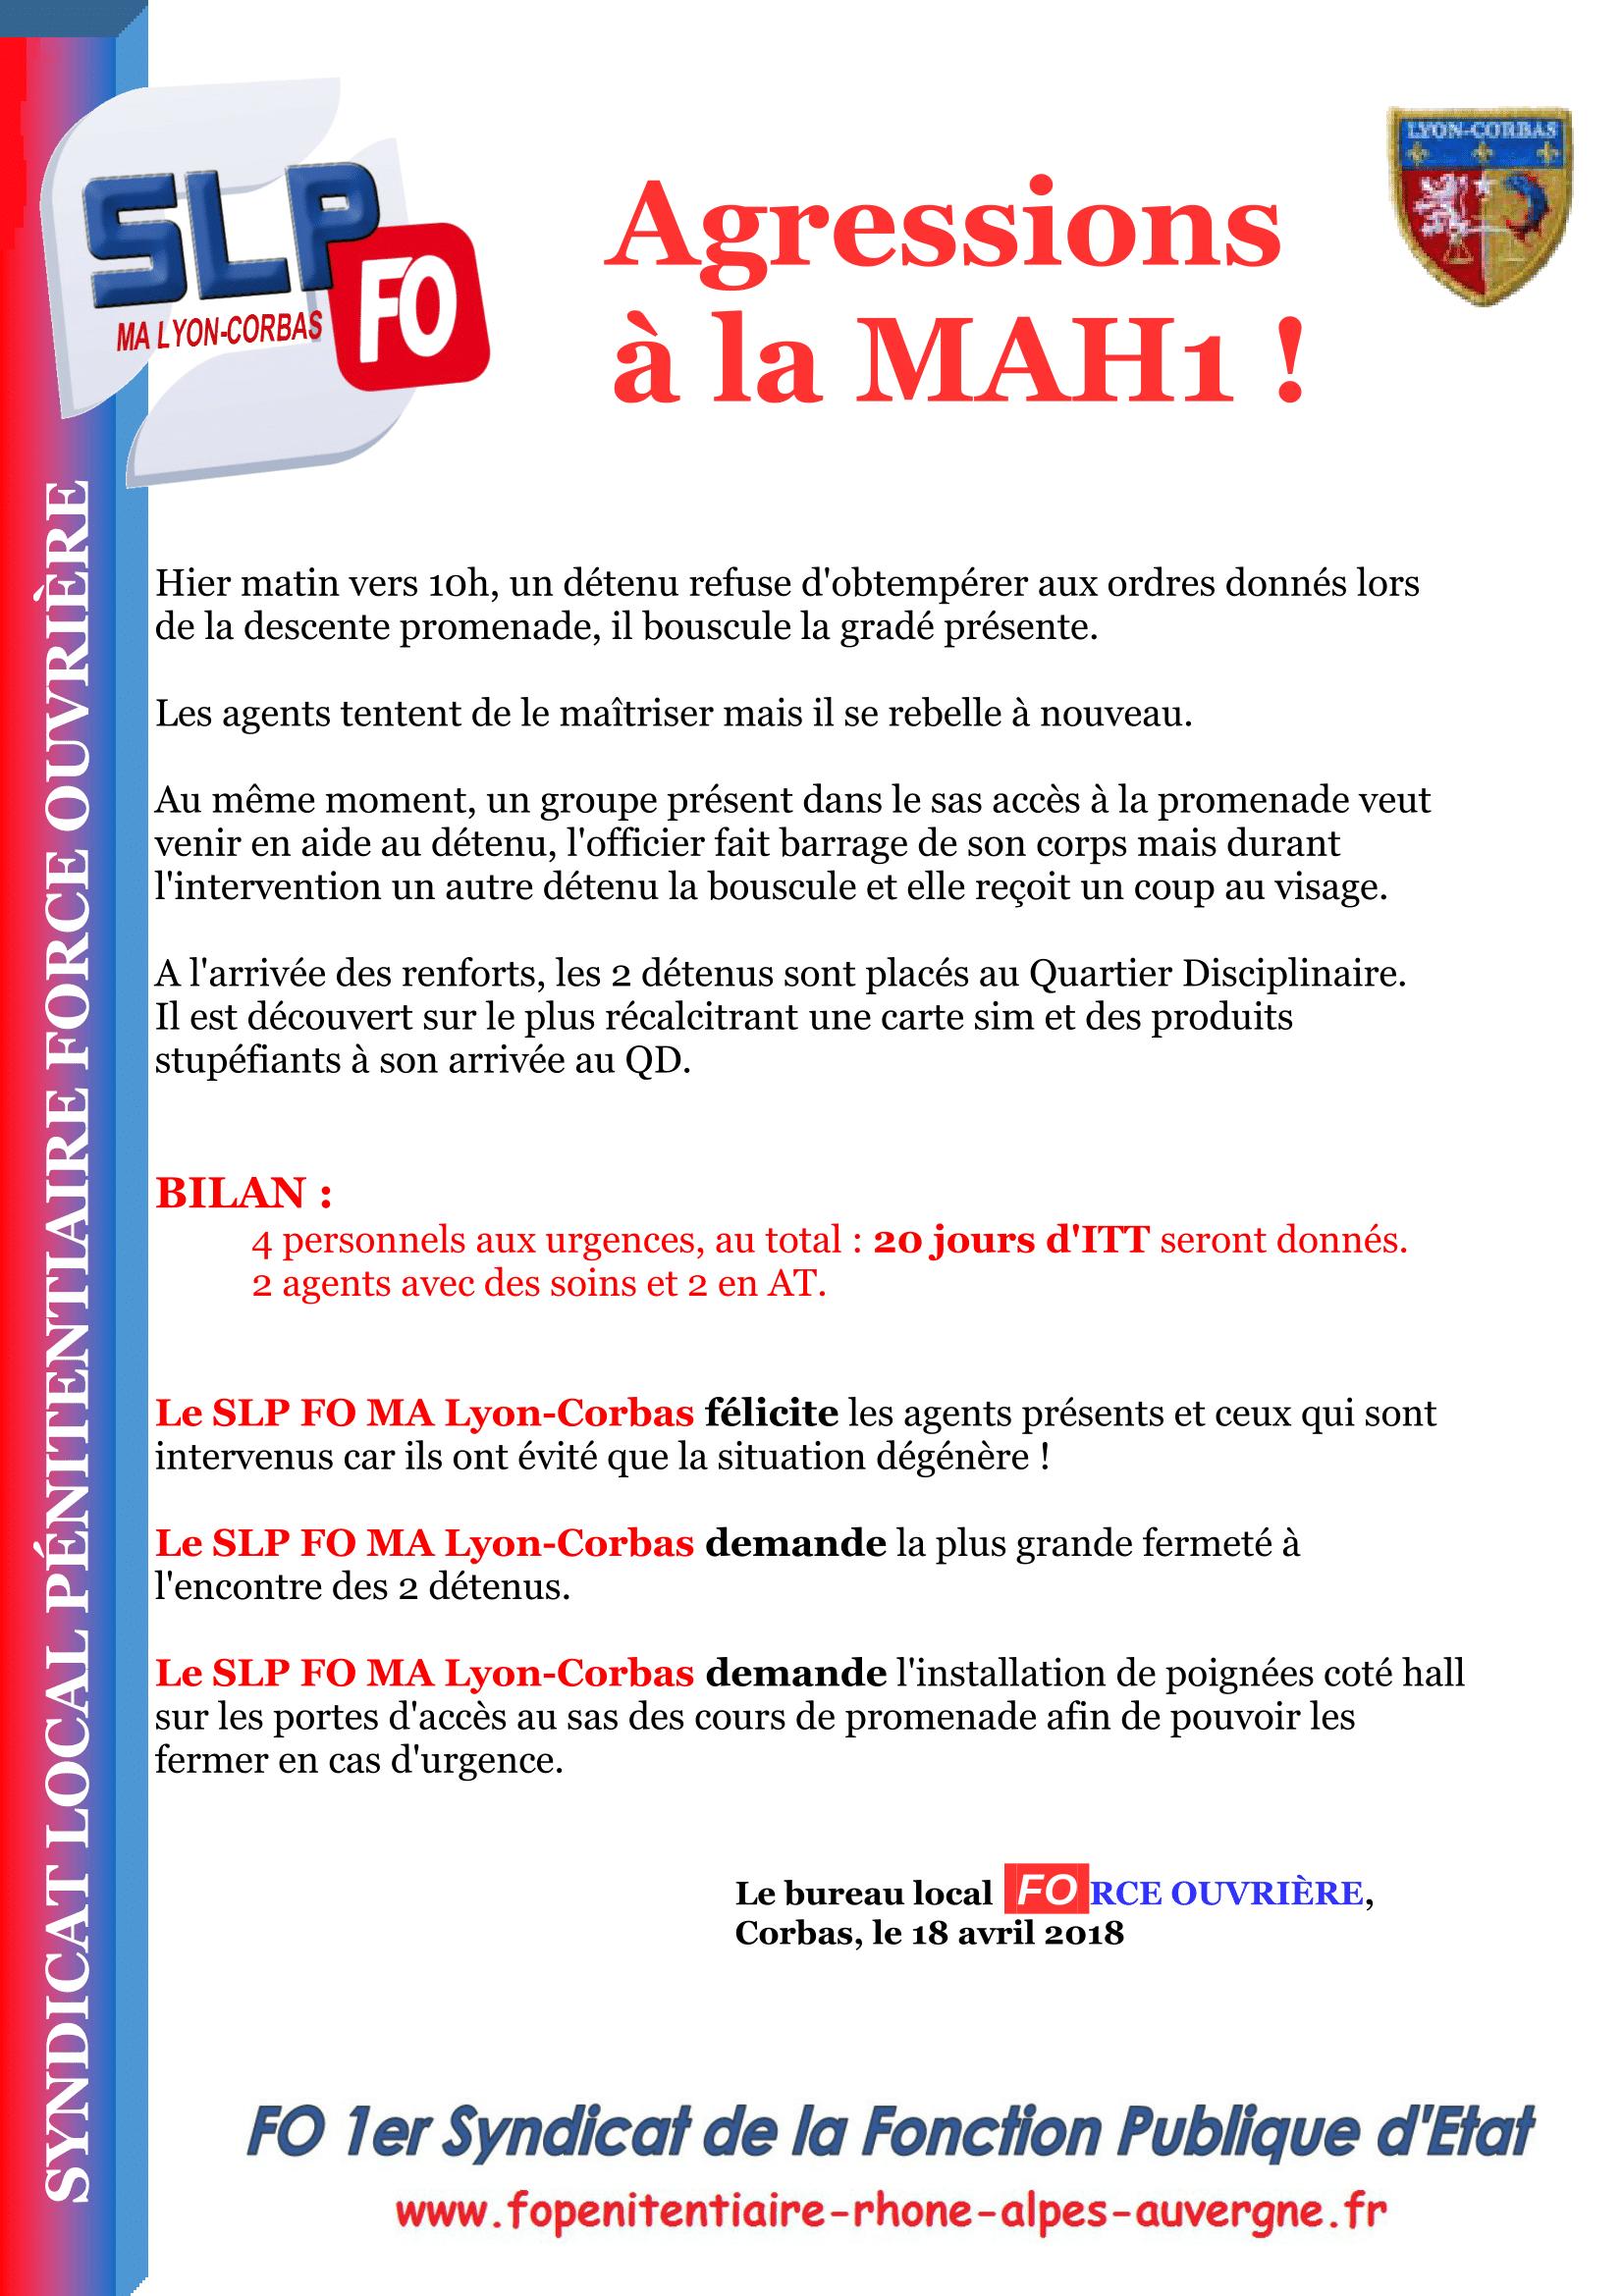 Agressions MAH1-1